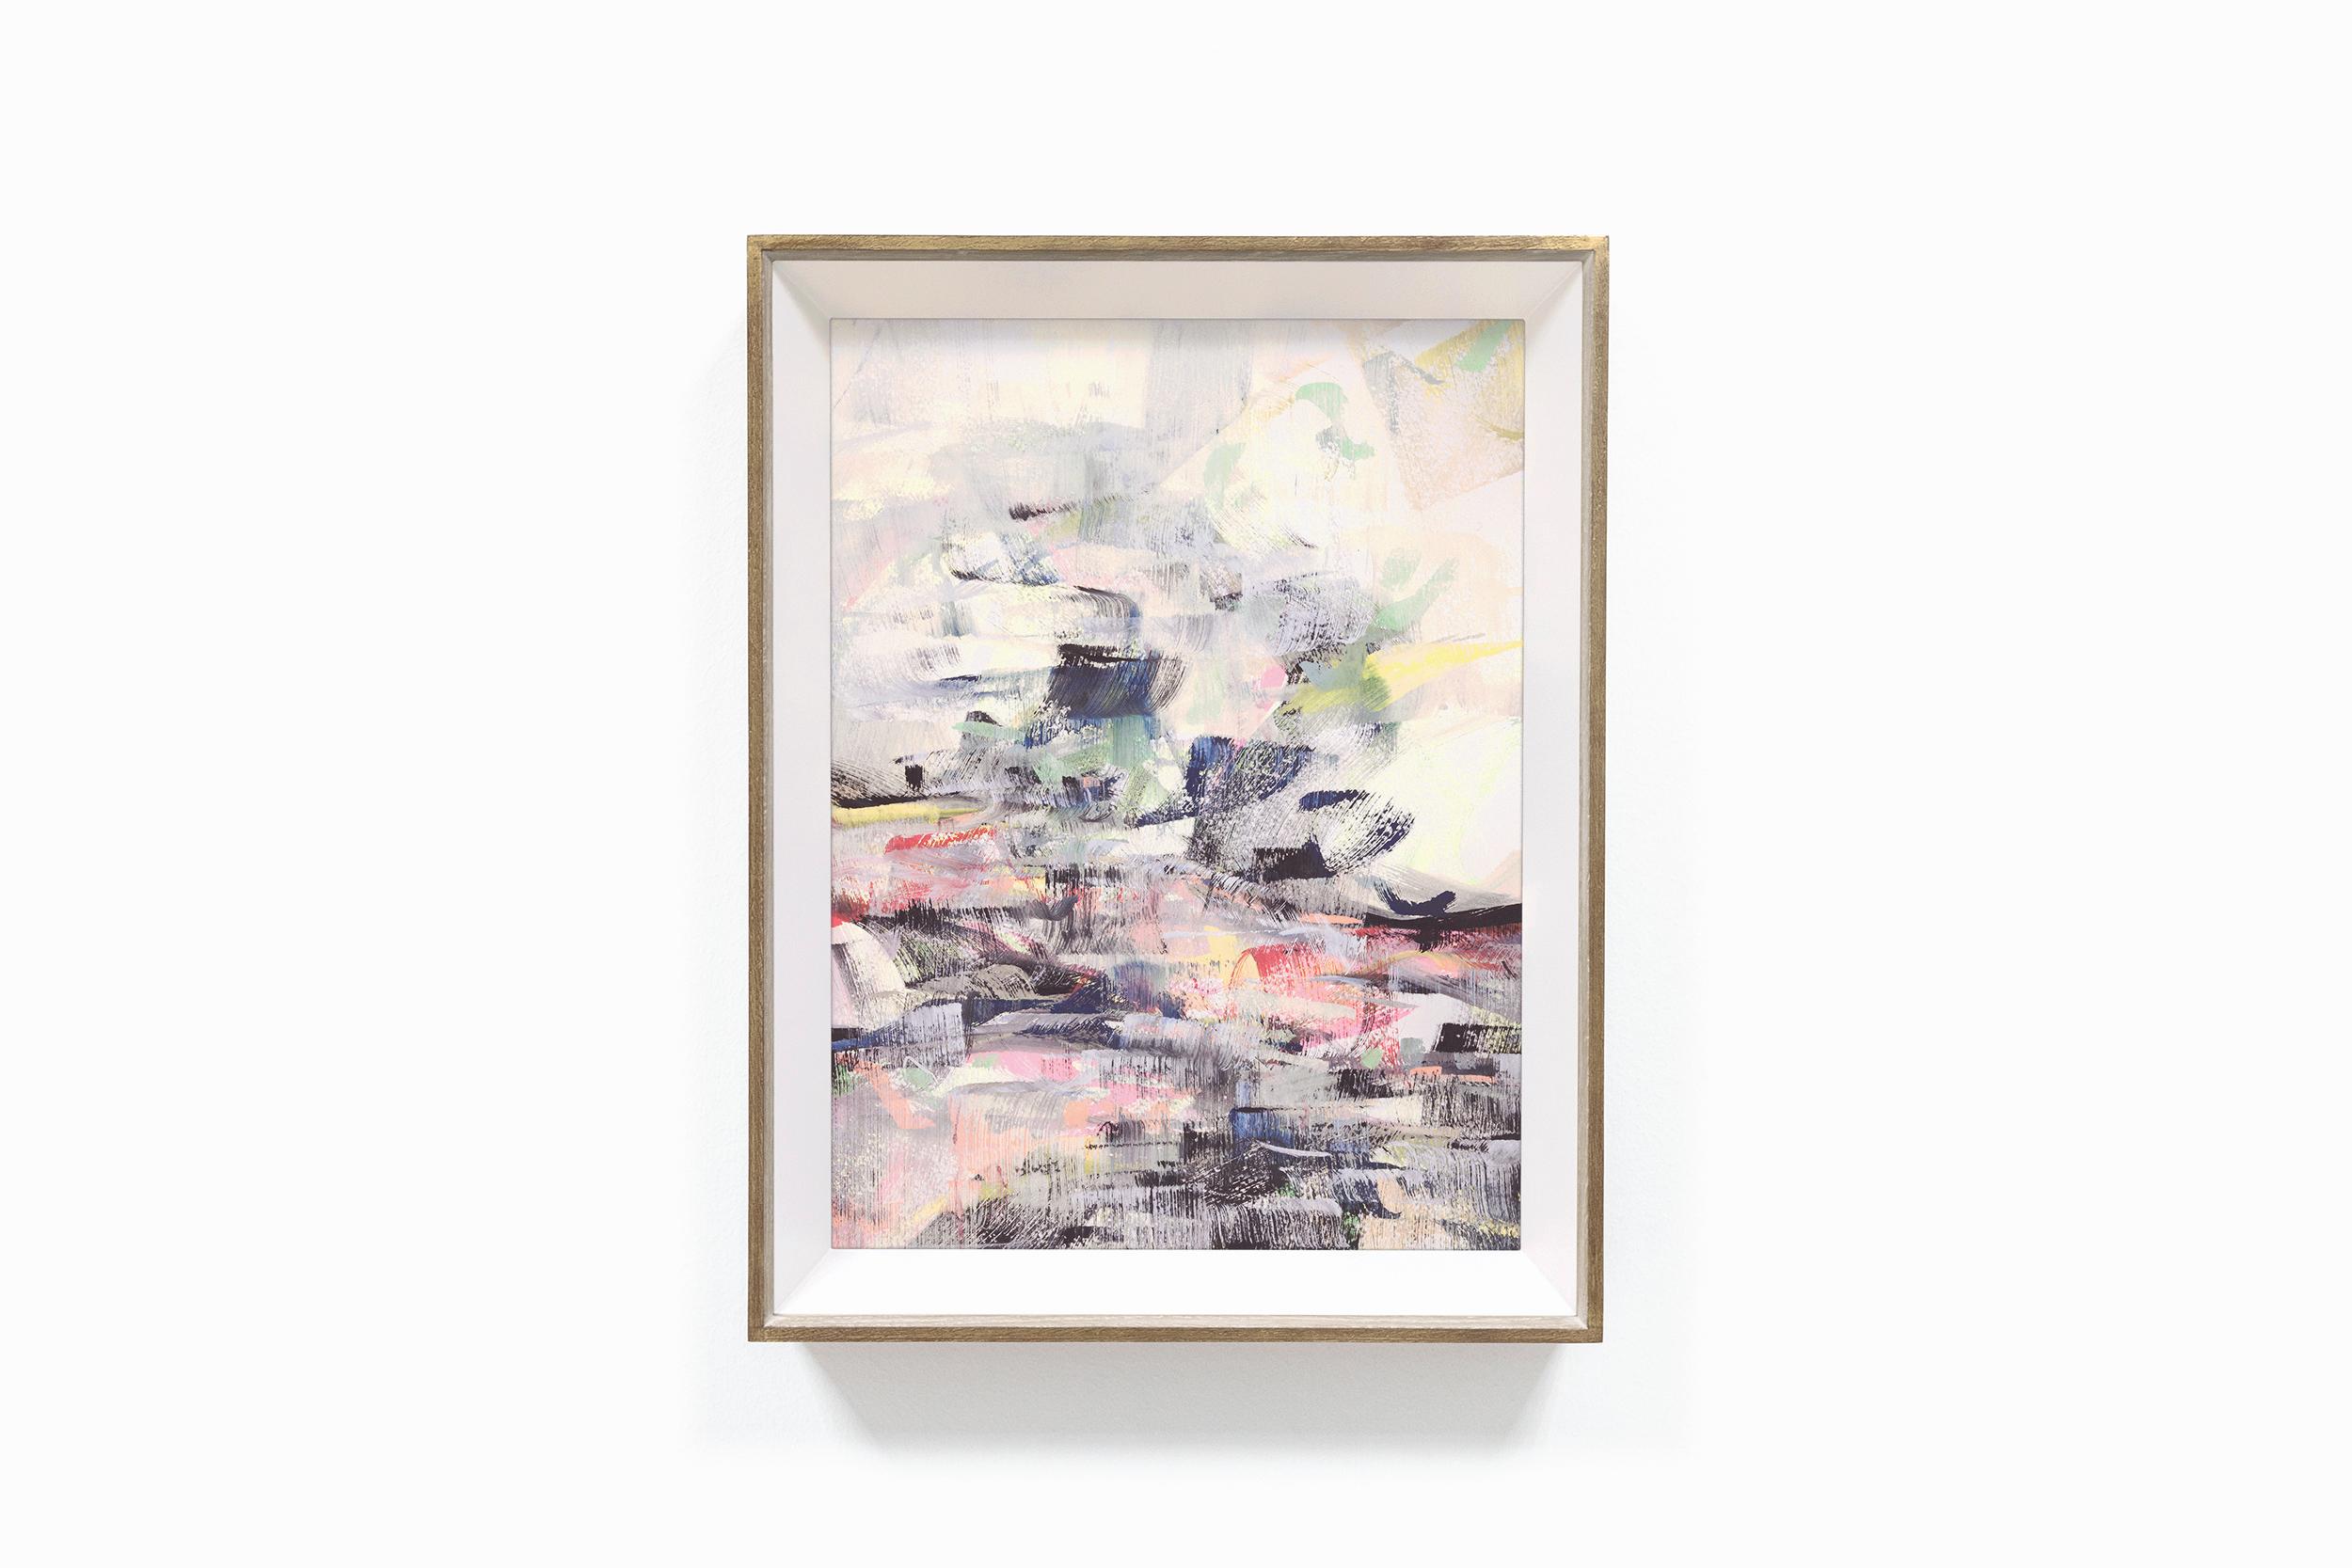 bonjourmolotov+Deambulaia+40x30+Illustration+Ilustracao+painting+pintura+acrylic+acrílico+canvas+tela+paper+cardboard+mdf+Andre+Gigante+32N9.jpg